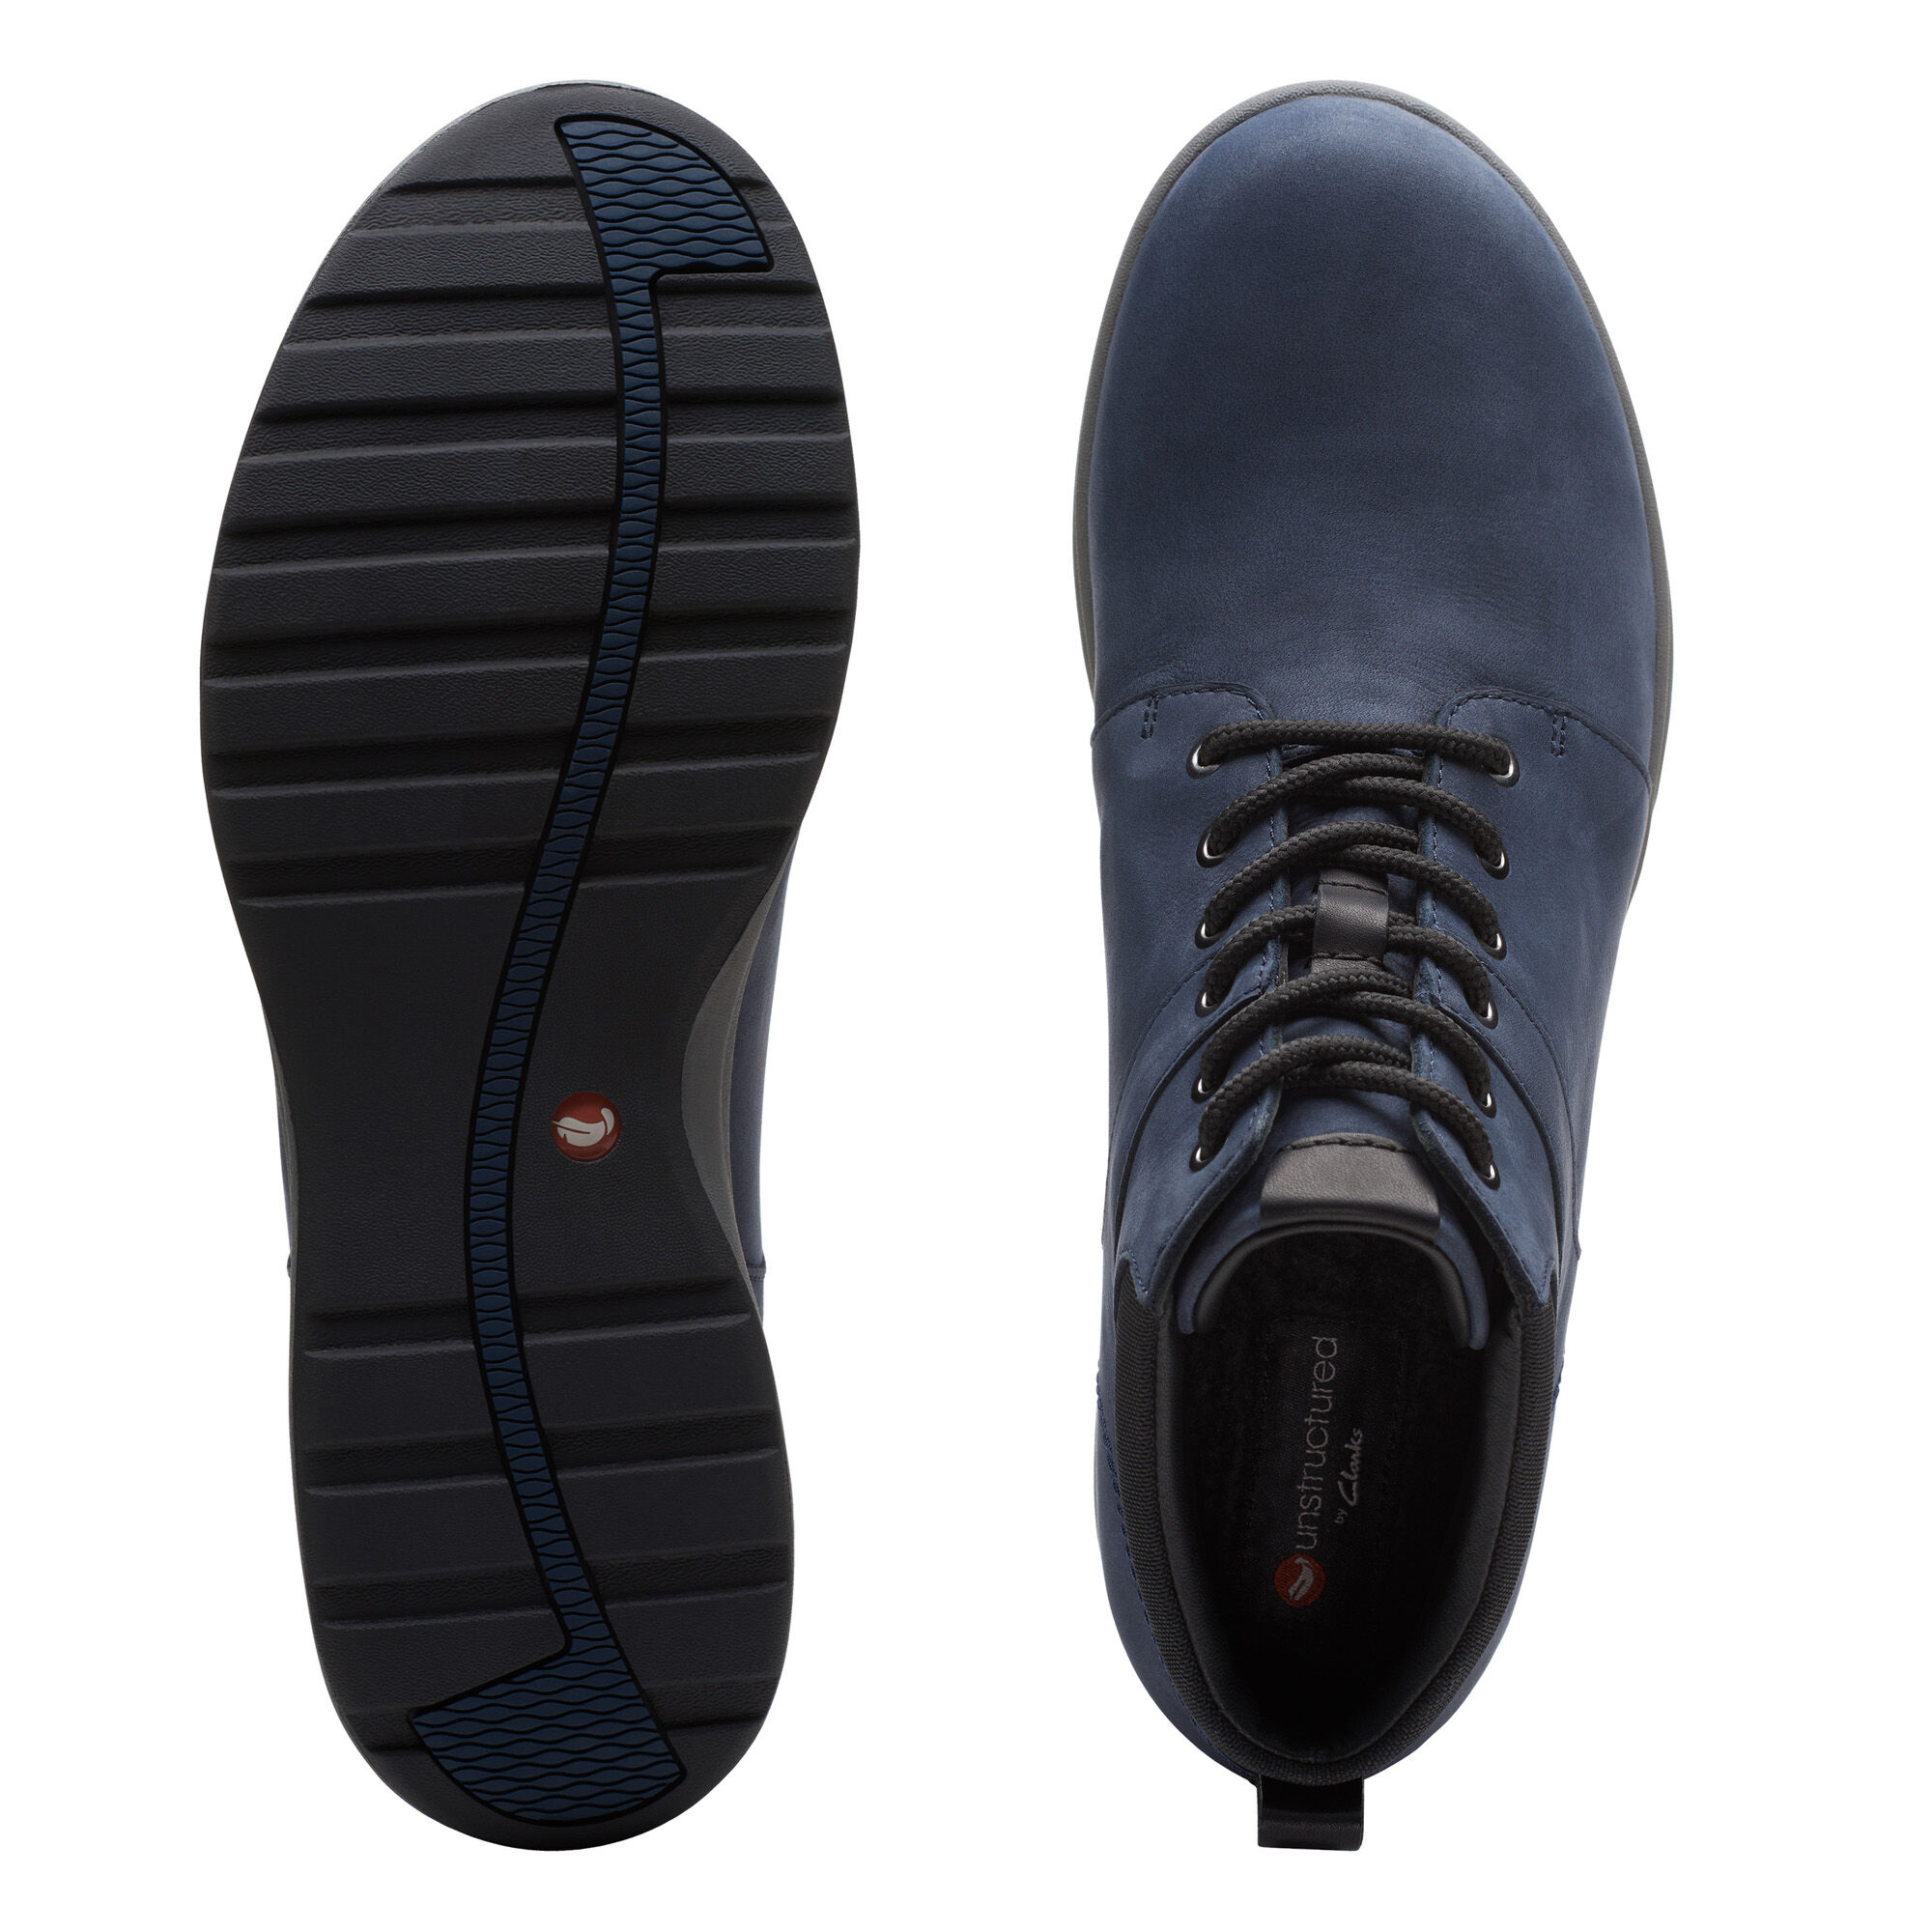 Women's Navy Nubuck Walking Boots - Un